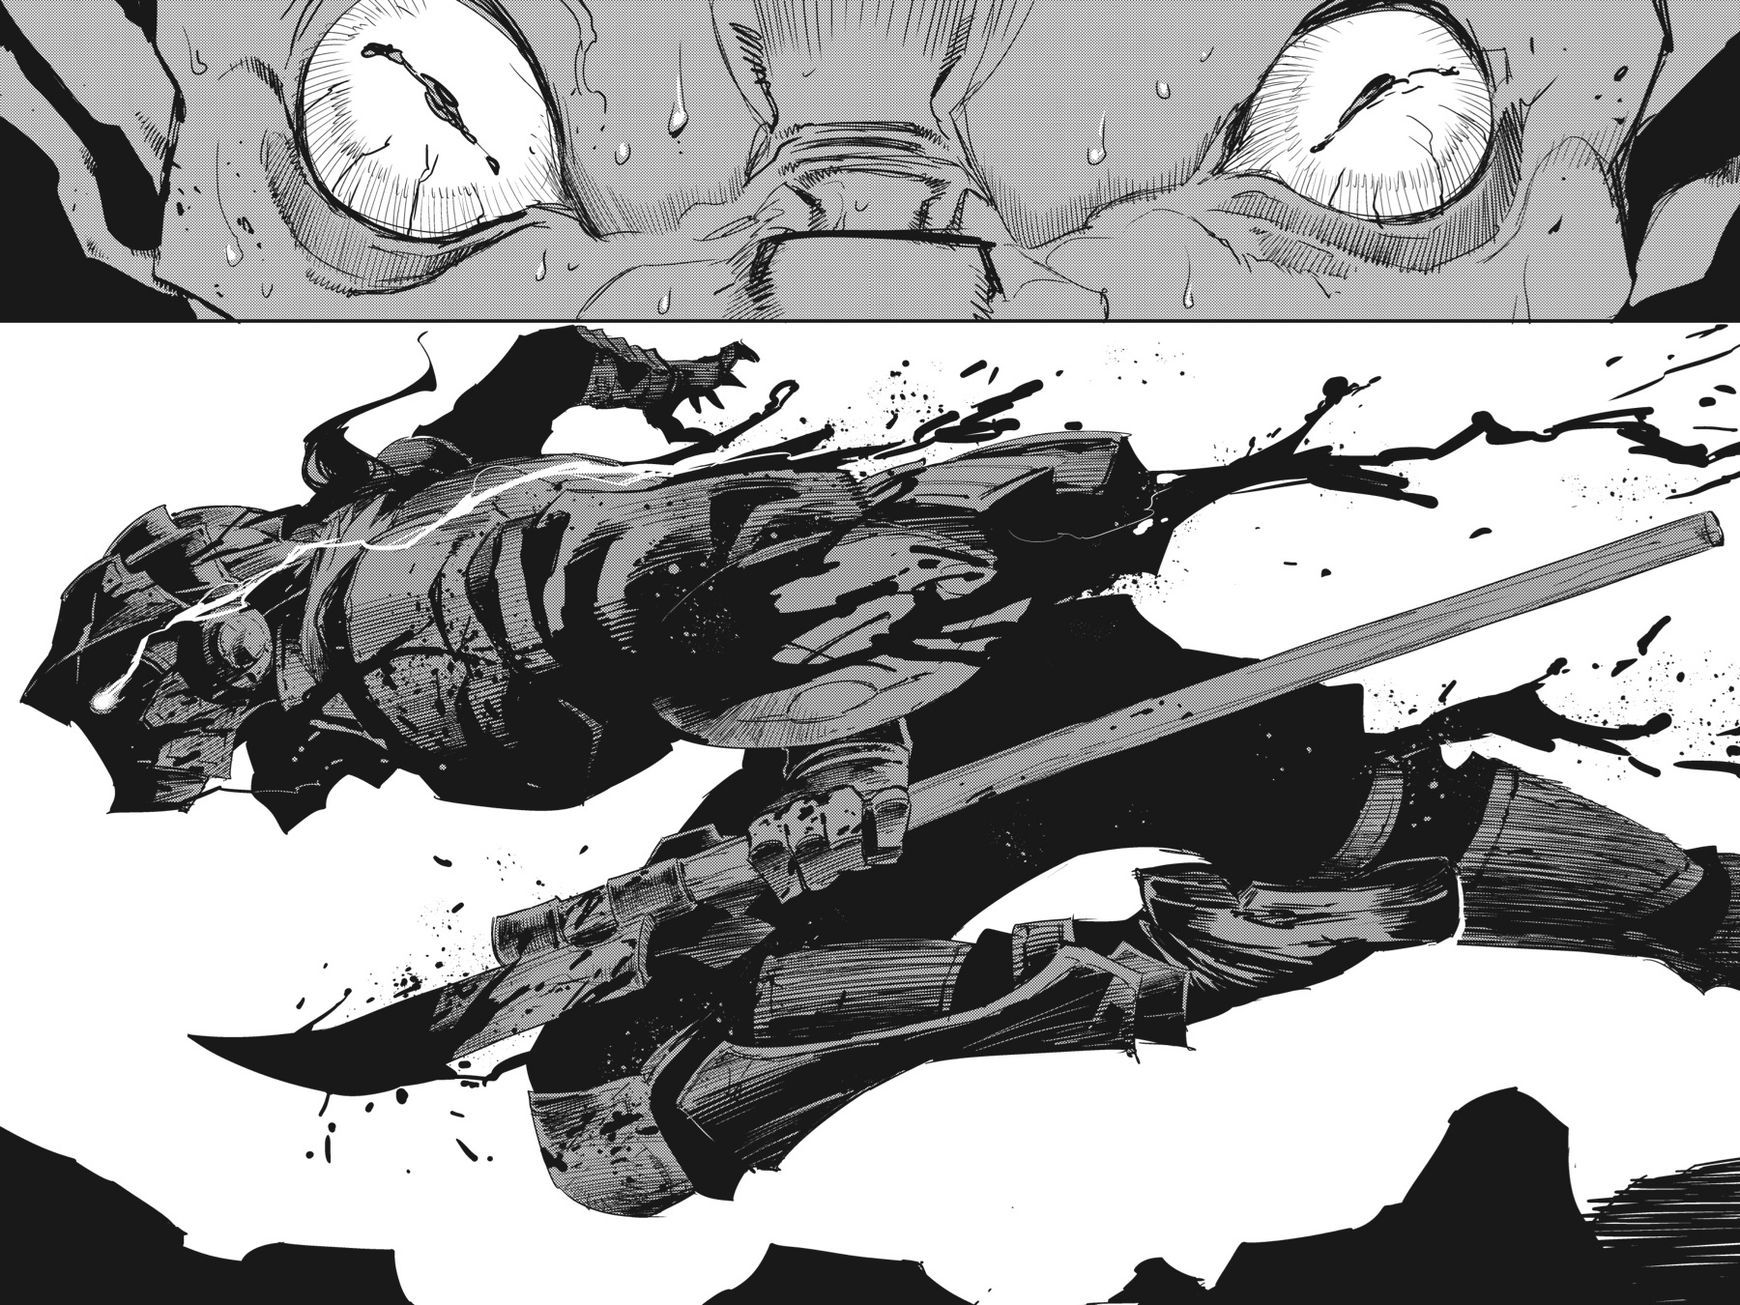 Goblin Slayer Ch 027 Stream 1 Edition 1 Page 28 Mangapark Read Online For Free Slayer Goblin Goblin Slayer Meme